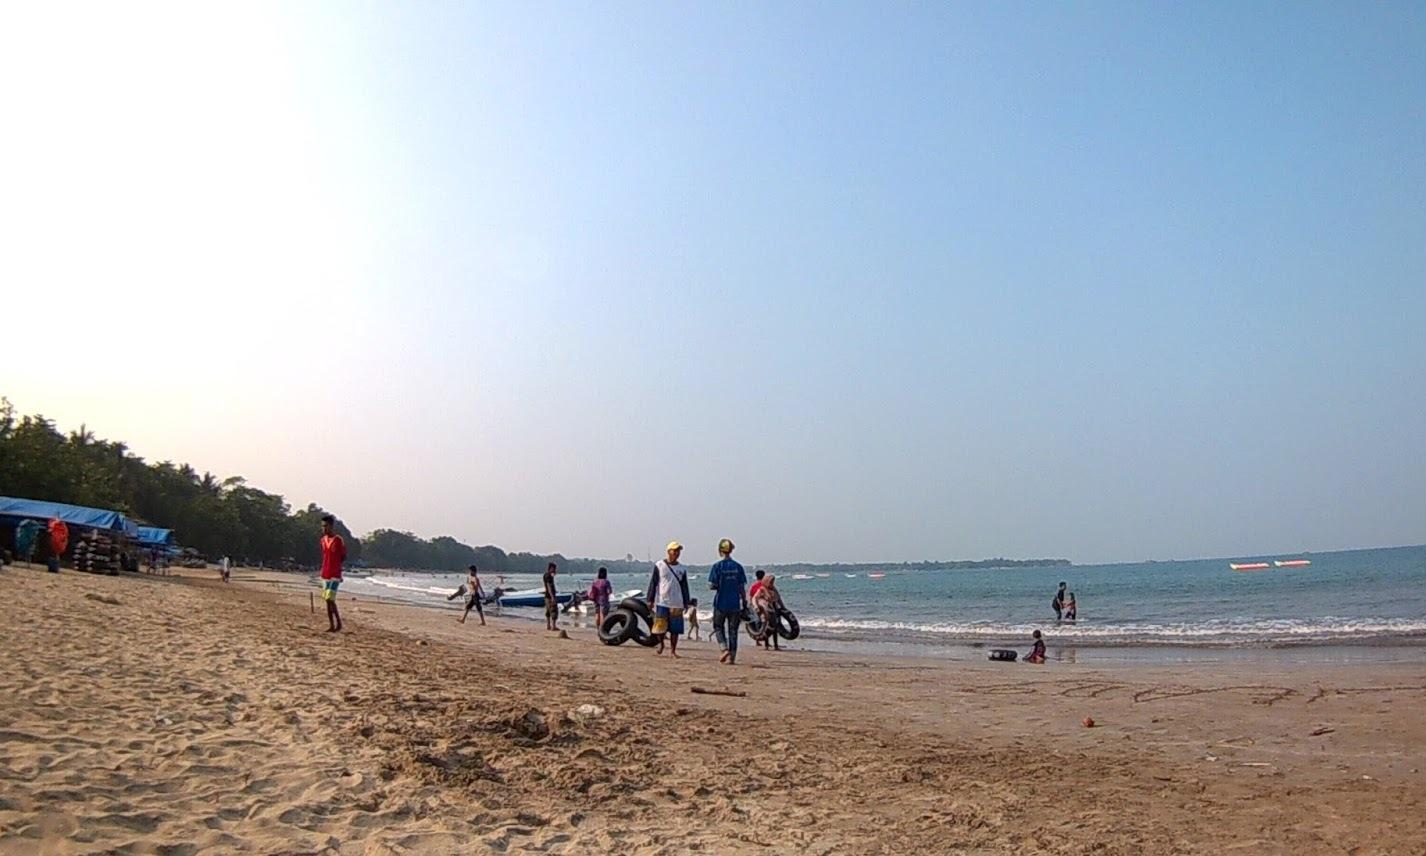 Pantai Carita Pandeglang Terkenal Sejak Dulu Tempat Wisata Banten Kab